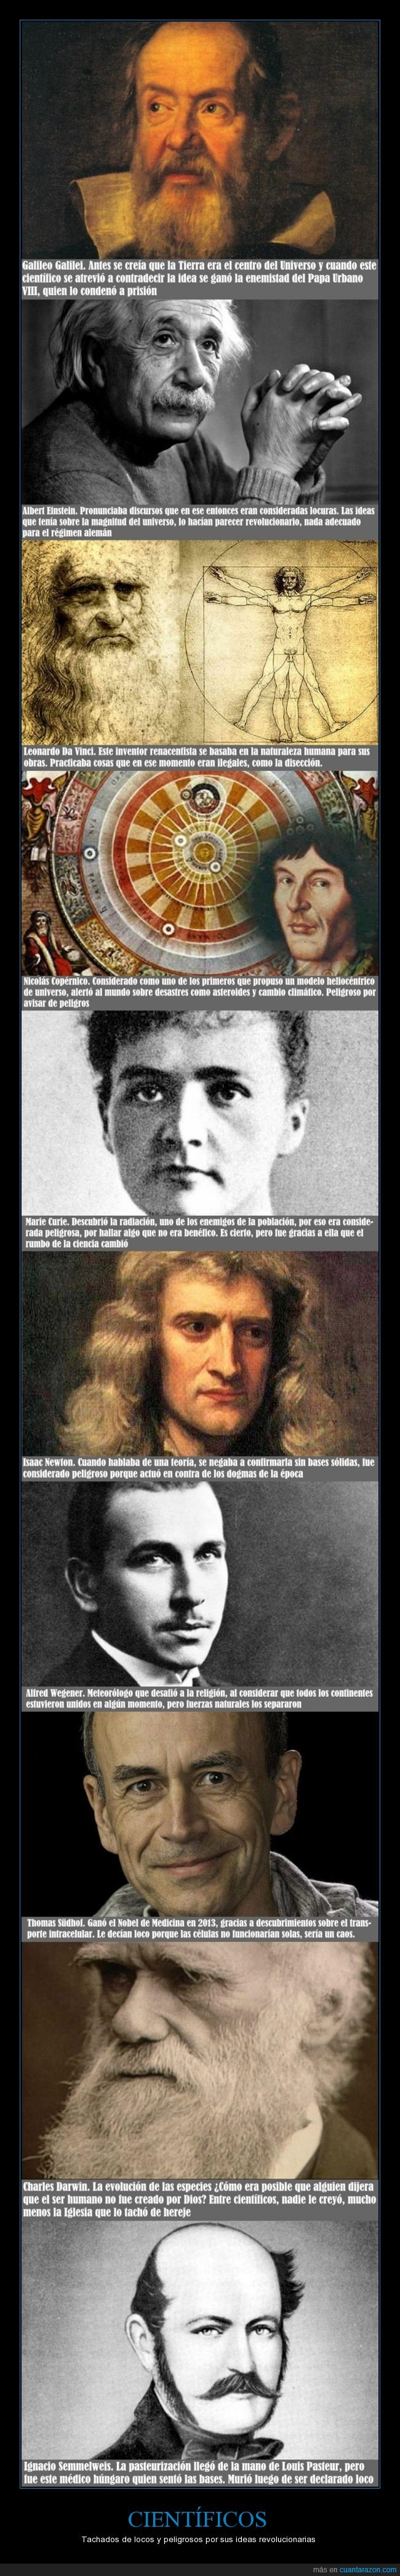 Albert Einstein,Alfred Wegener,Charles Darwin,científicos,Galileo Galilei,grandes mentes,Ignacio Semmelweis,Isaac Newton,Leonardo Da Vinci,Marie Curie,Nicolás Copérnico,teorías,Thomas Südhof